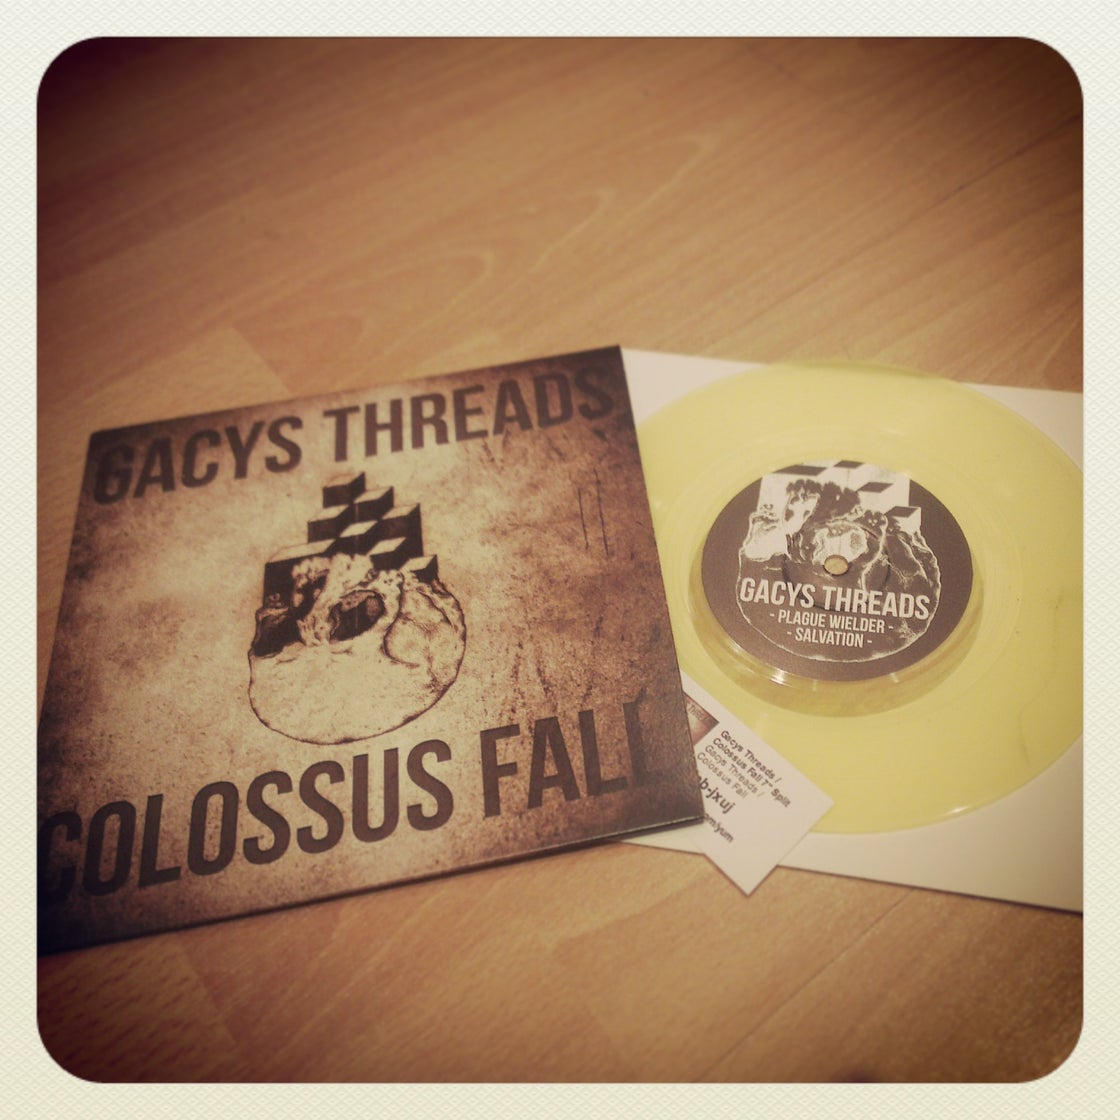 "Image of Gacys Threads / Colossus Fall 7"" split"